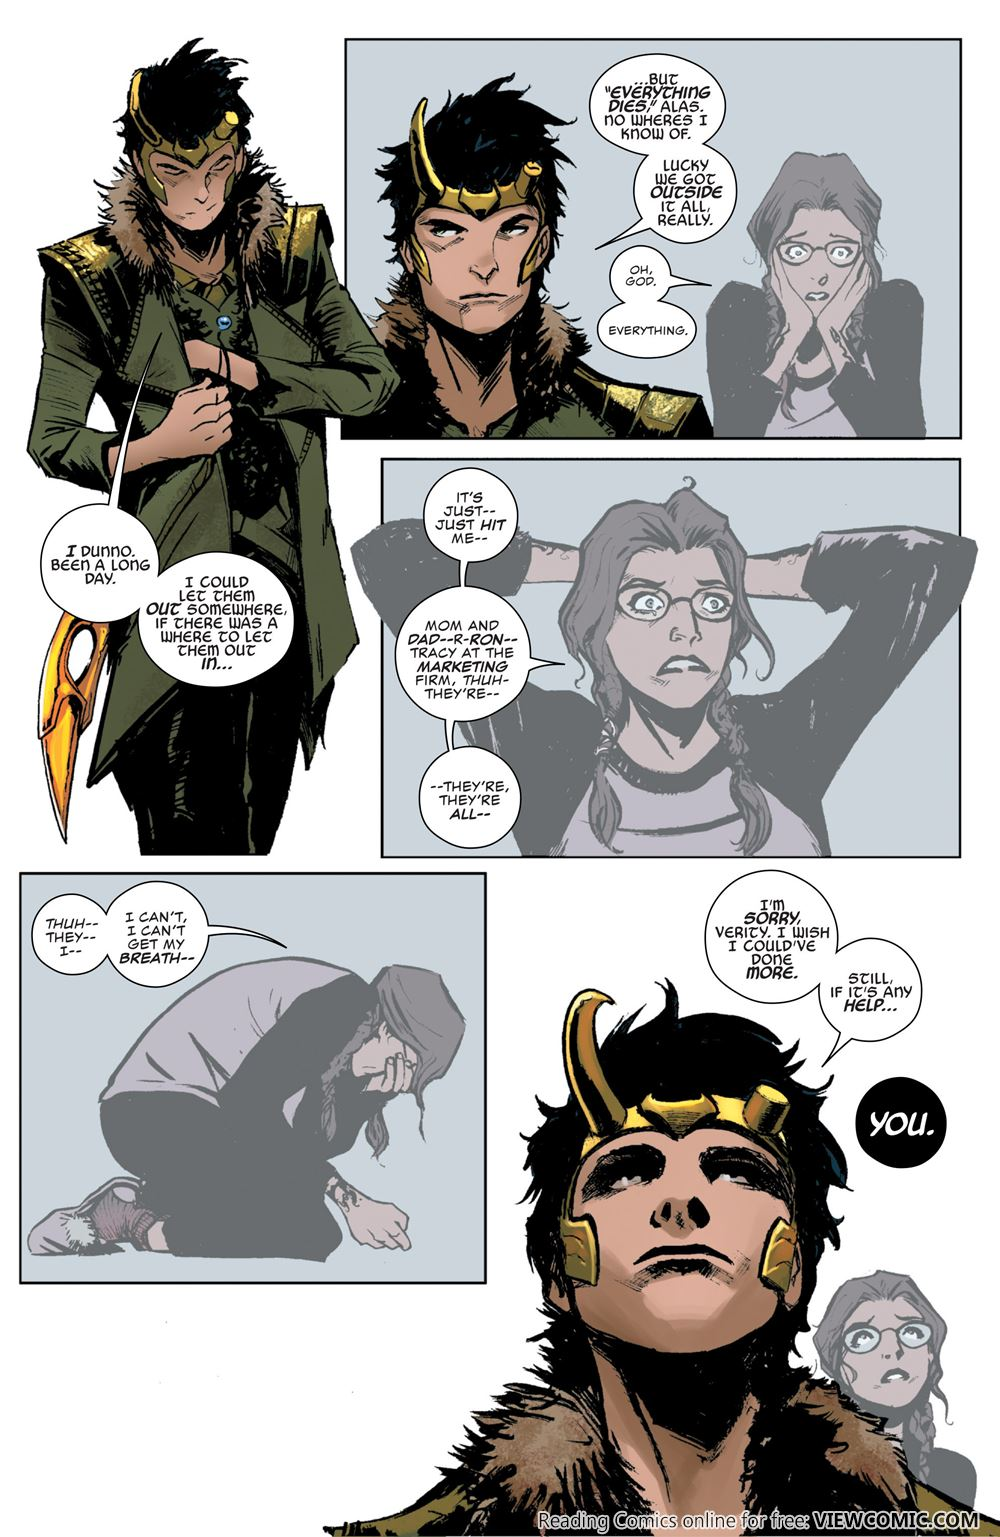 Loki v3 Agent of Asgard 016 (2015) ……………… | Viewcomic